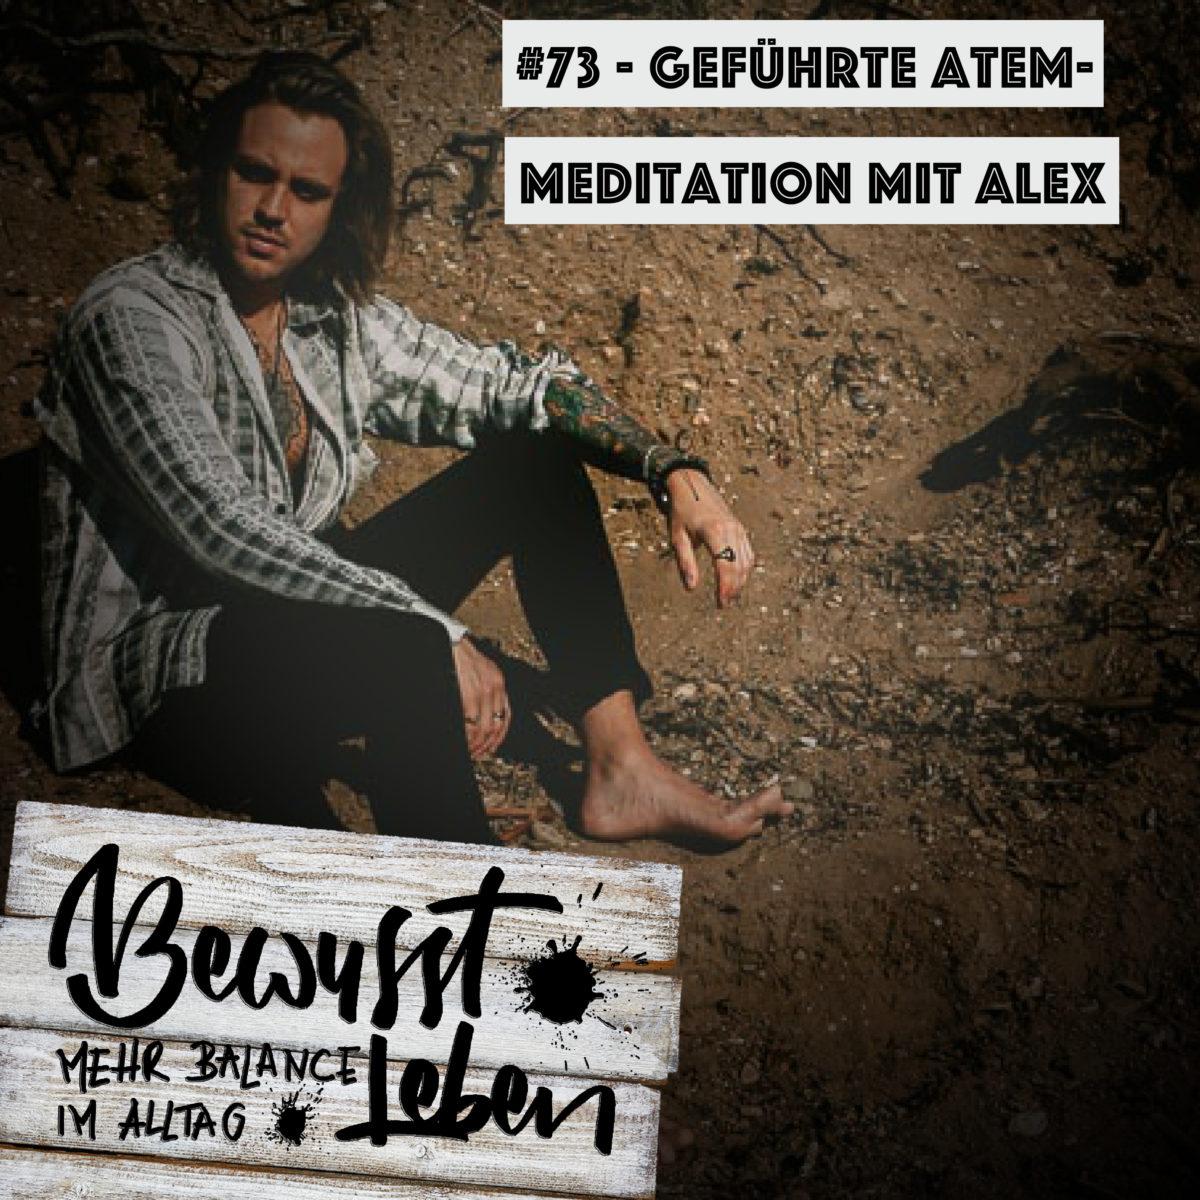 Geführte Atem-Meditation mit Alex